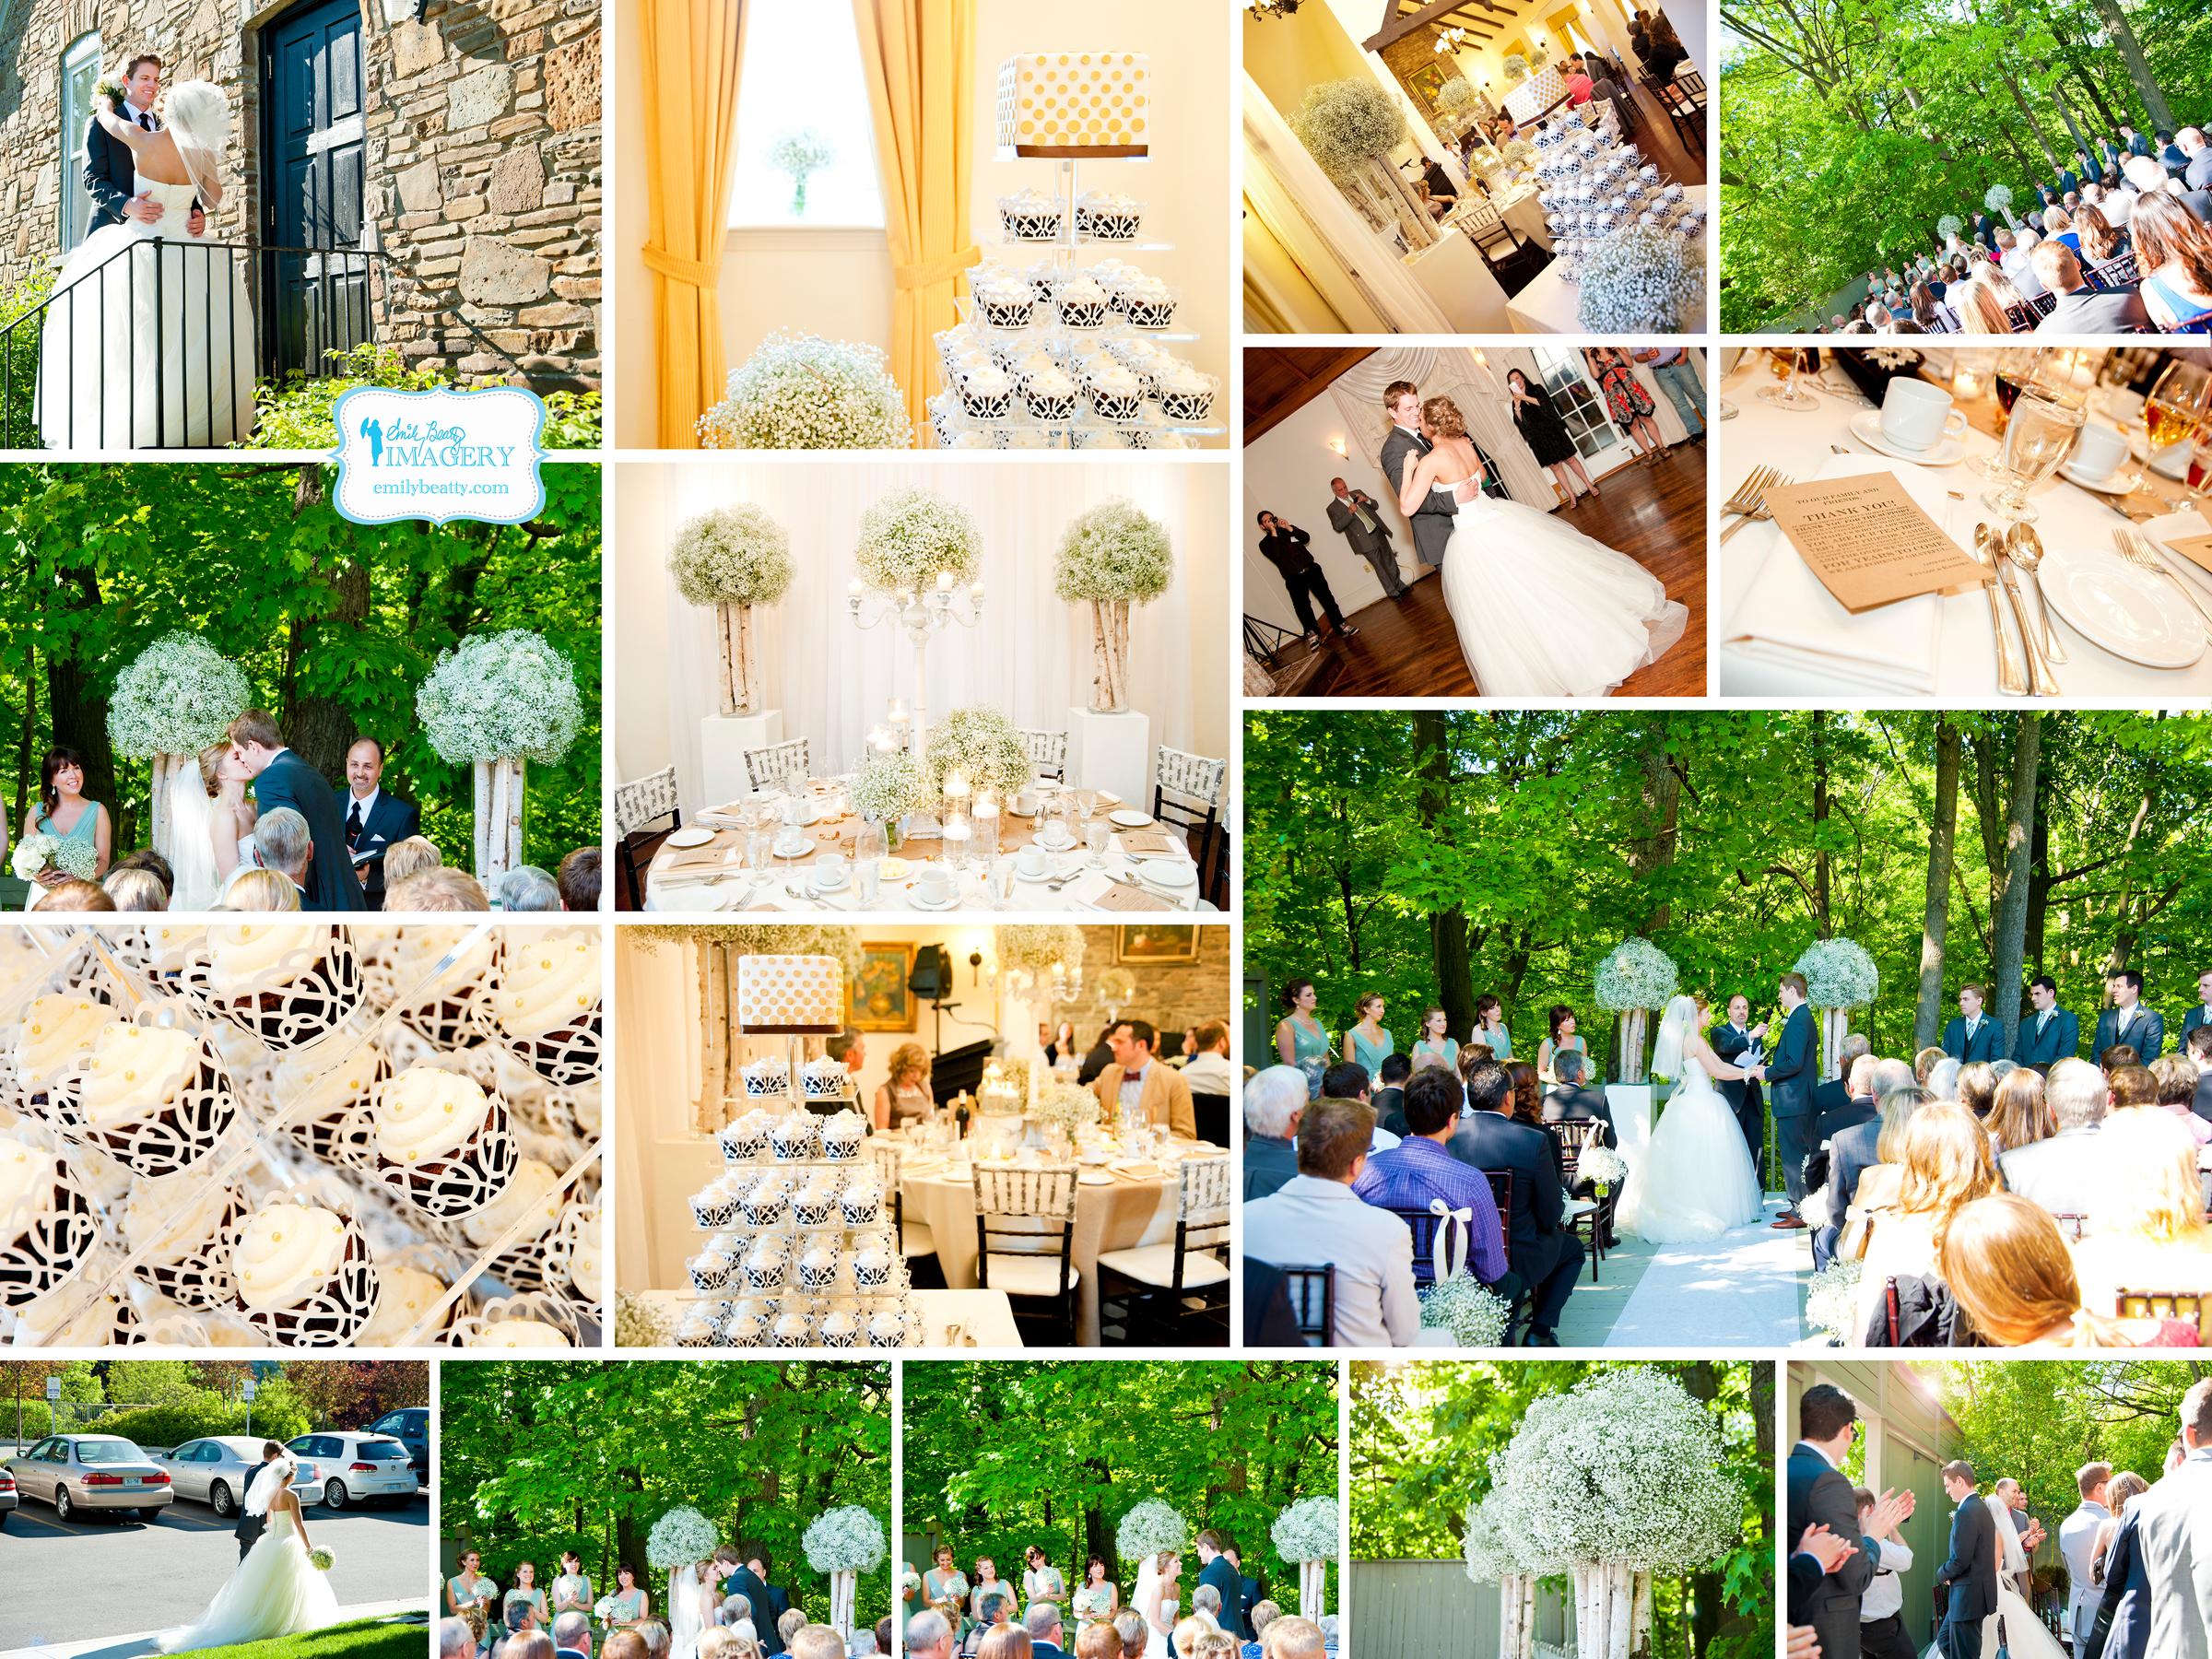 Shabby chic wedding at the Glenerin Inn